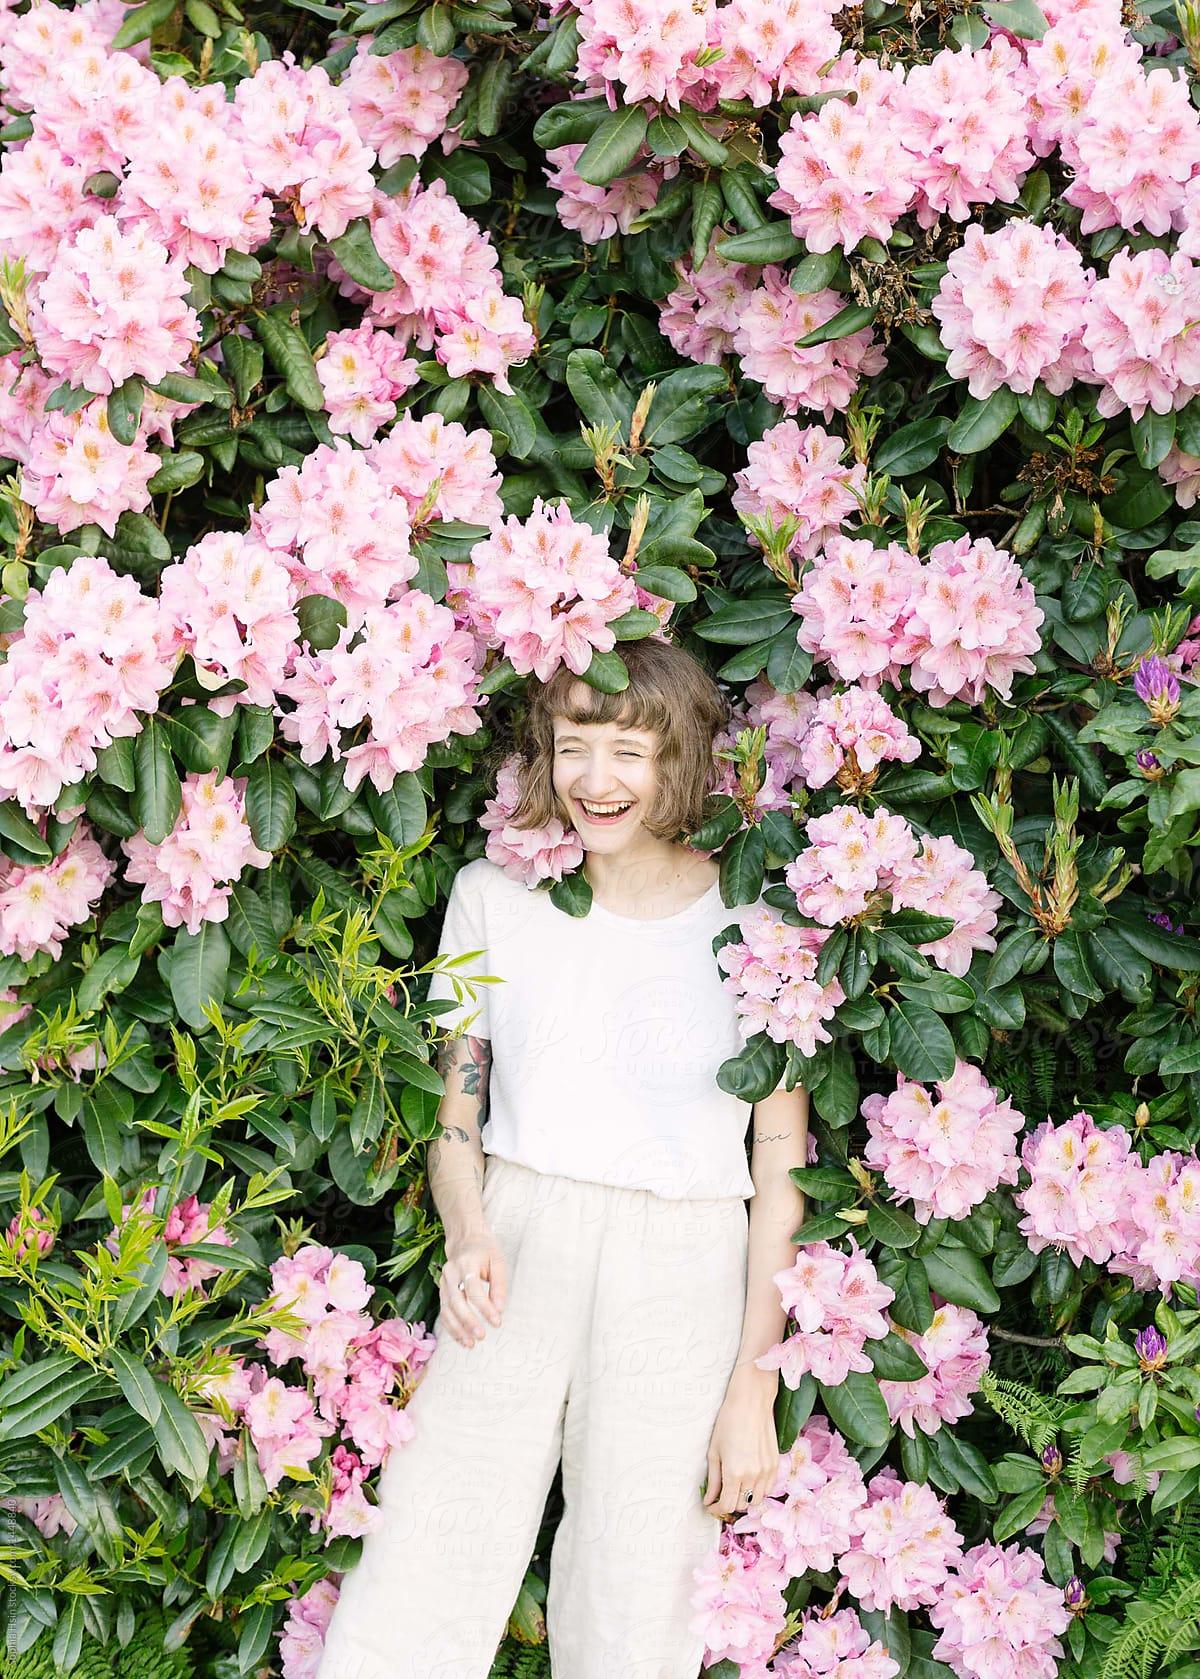 Portrait Of Girl Laughing In Pink Flower Bush Stocksy United